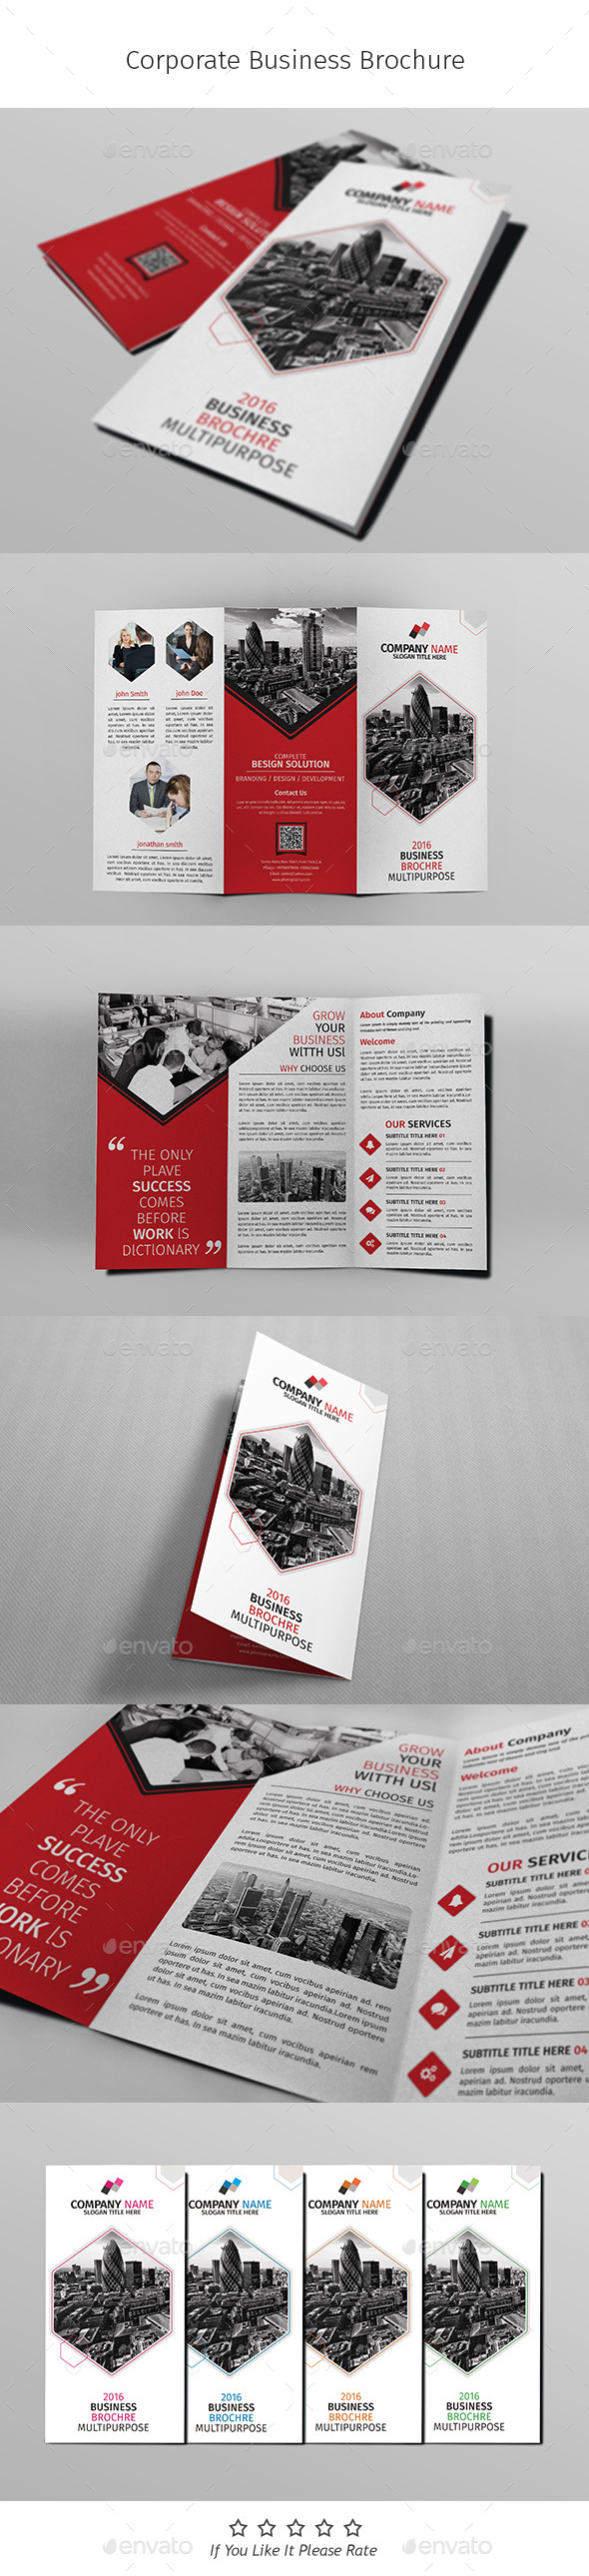 A4 Corporate Business Flyer Template Vol 05 - Corporate Brochures